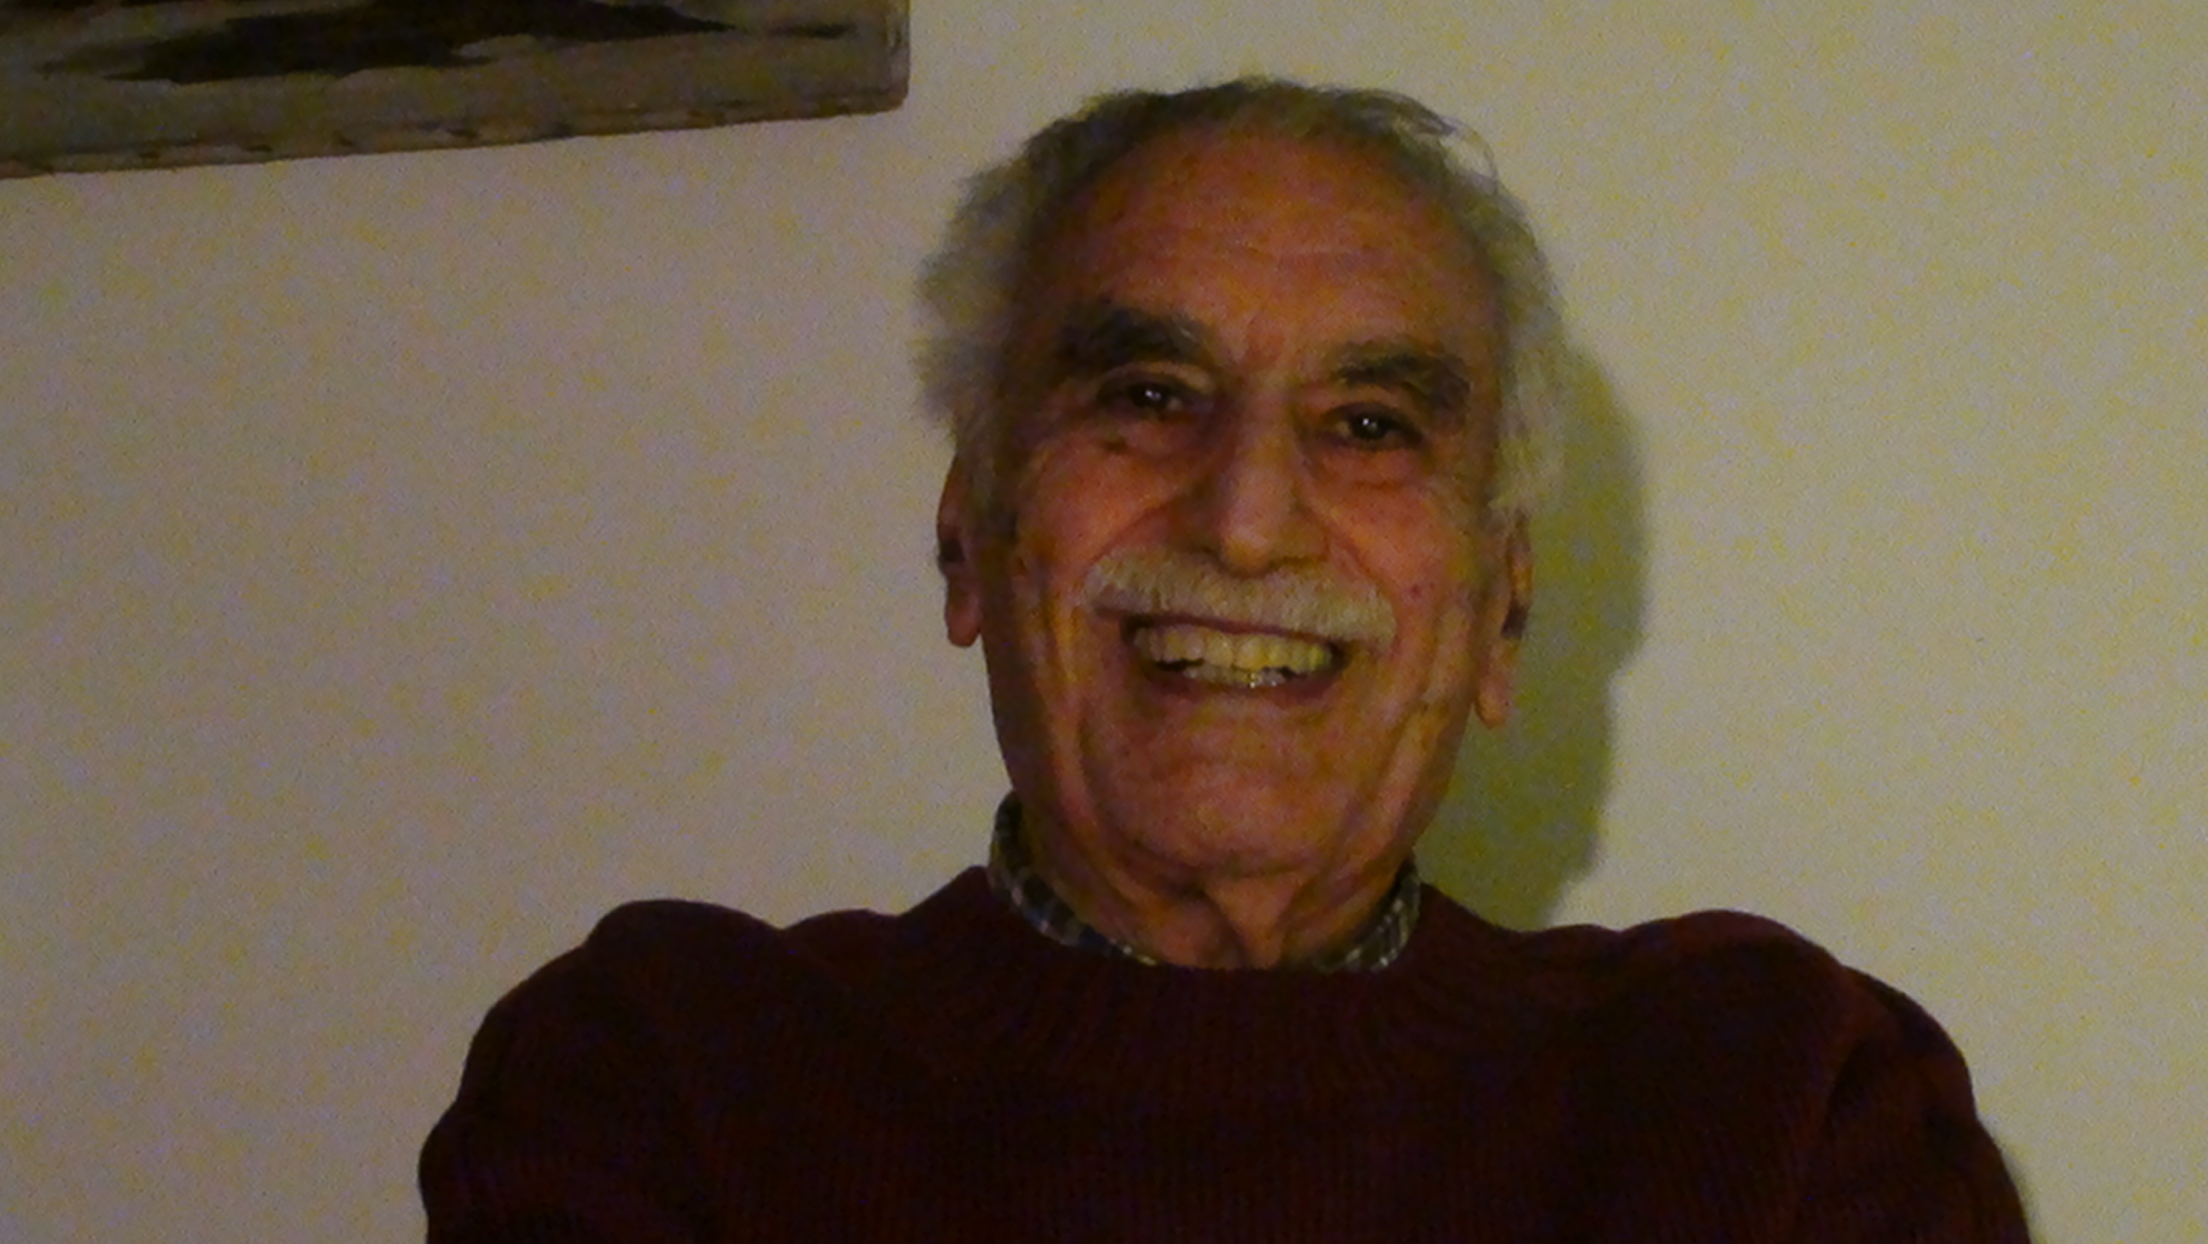 Ugo Gentile